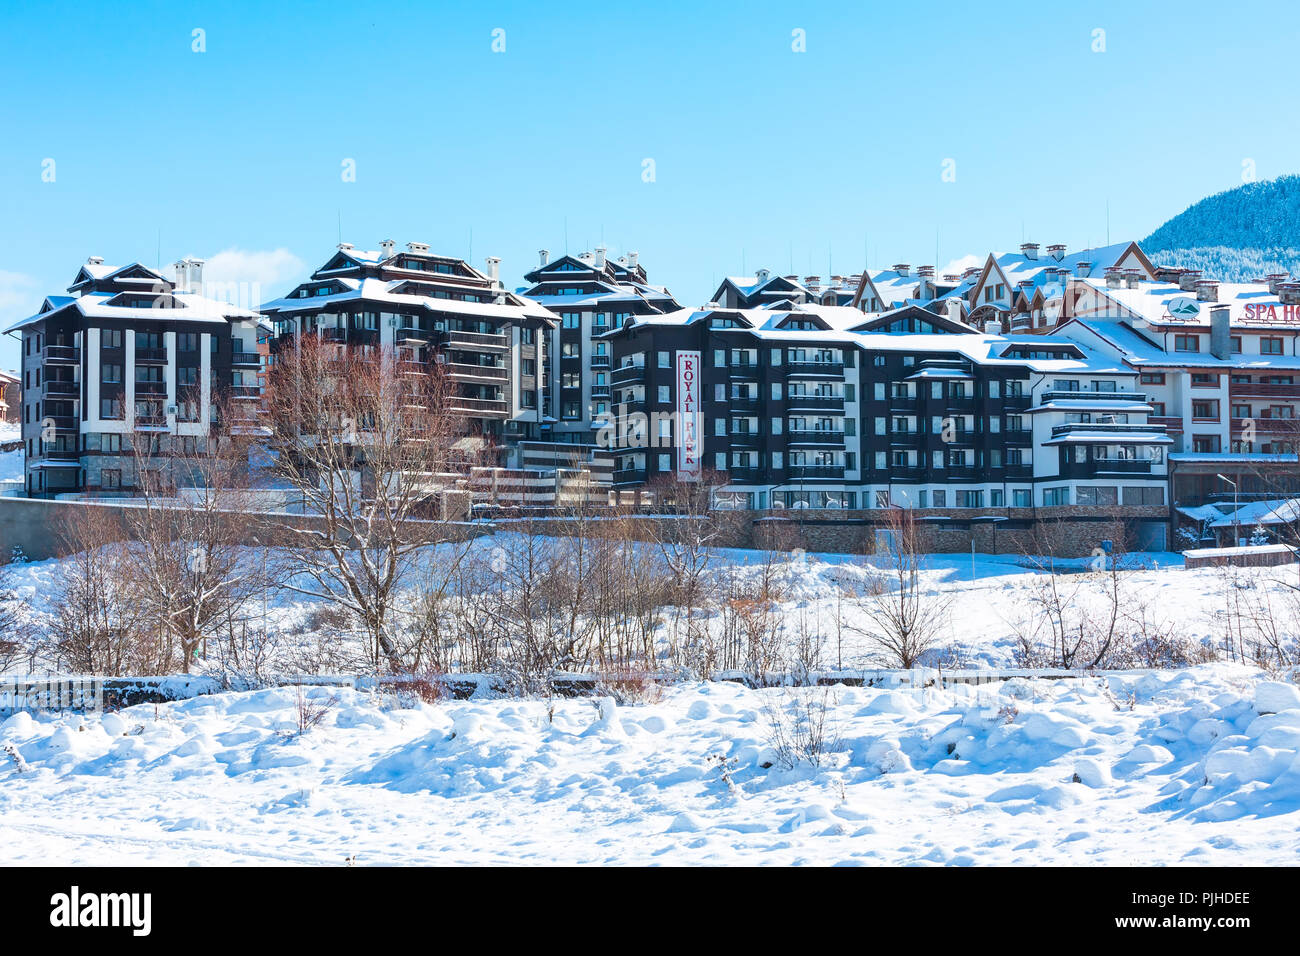 Bansko, Bulgaria - November 30, 2016: Hotels and street view in winter in bulgarian ski resort Bansko - Stock Image